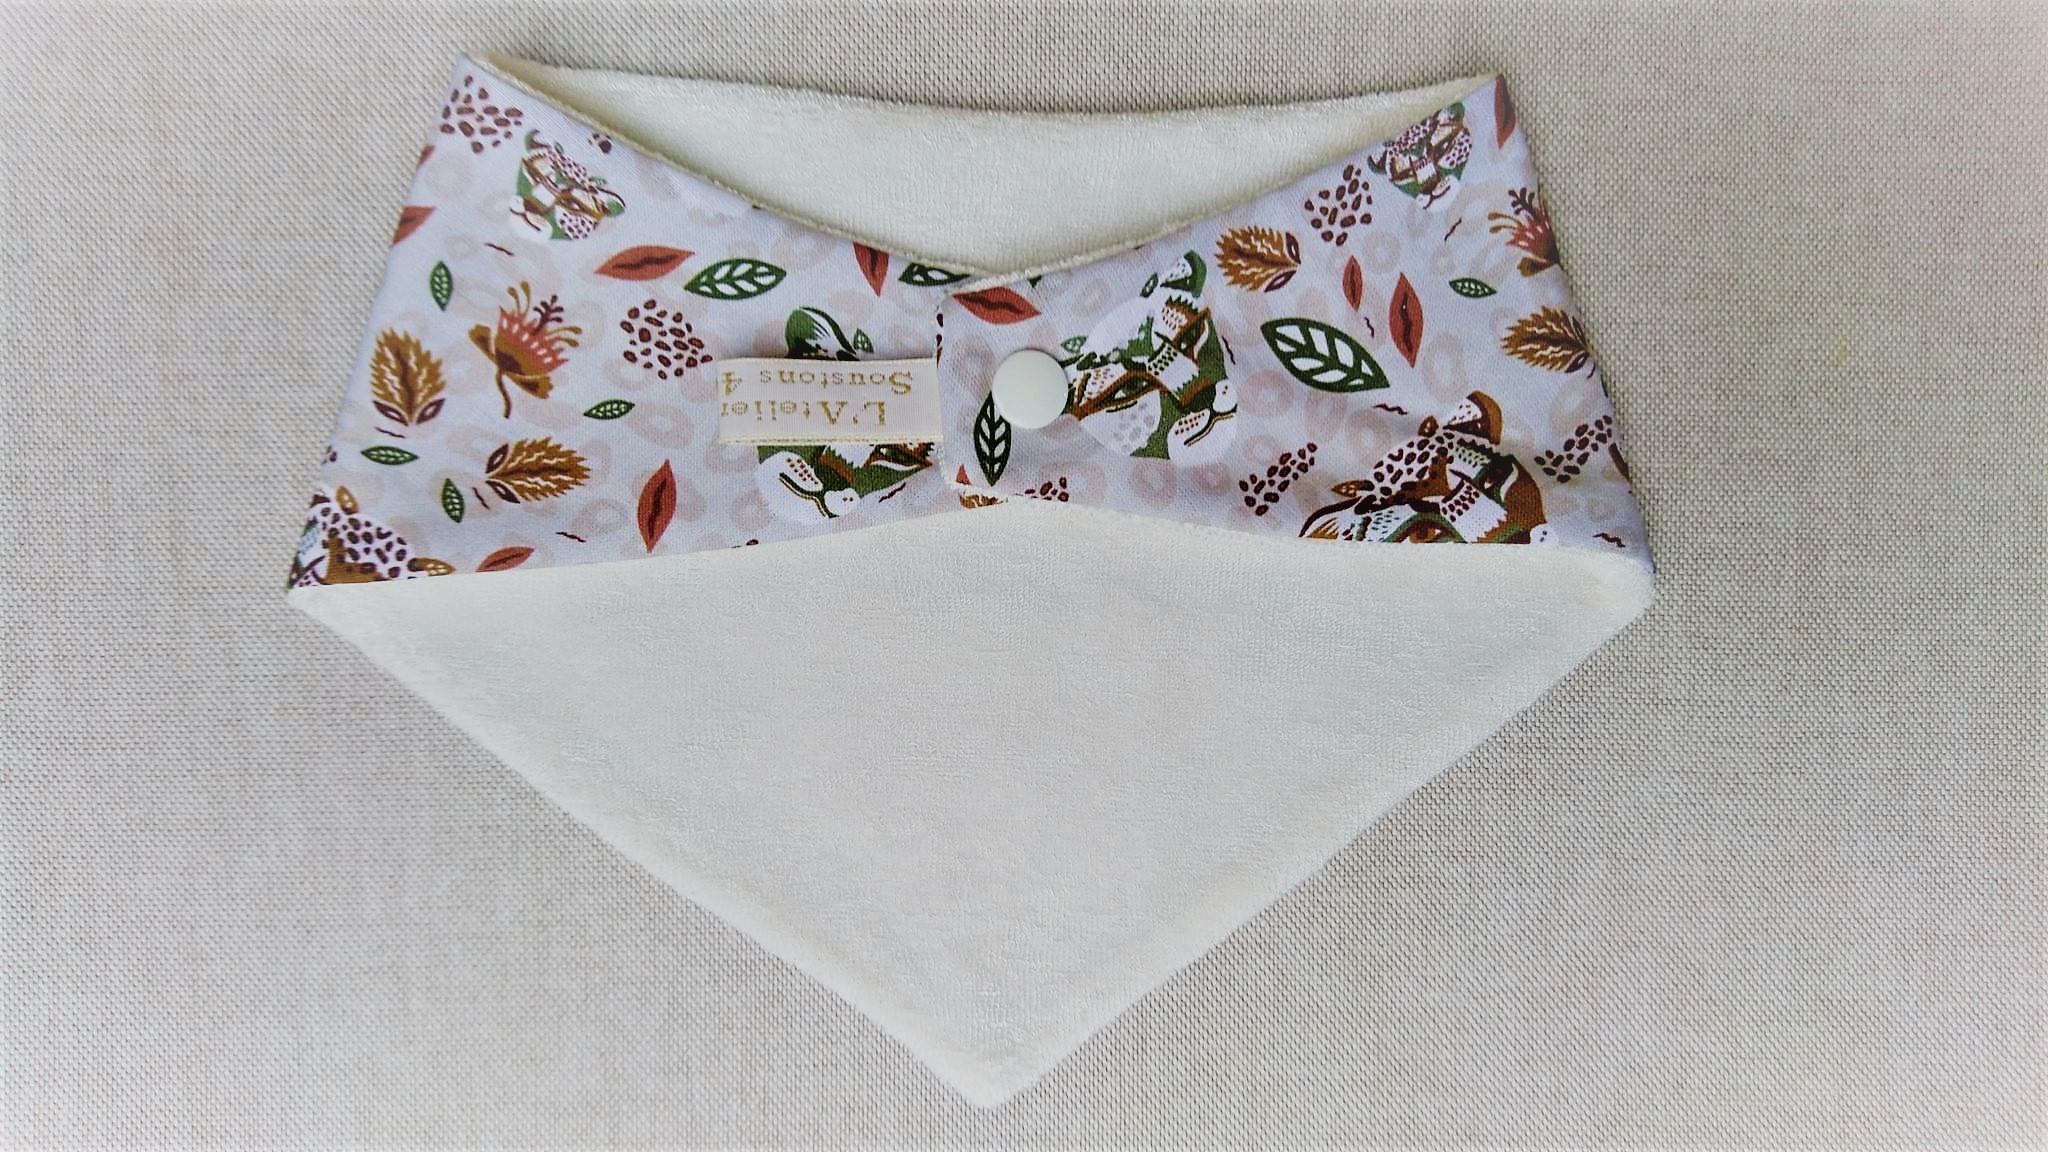 Bavoir bandana en coton et micro-éponge bambou certifiés oeko-tex, léopard